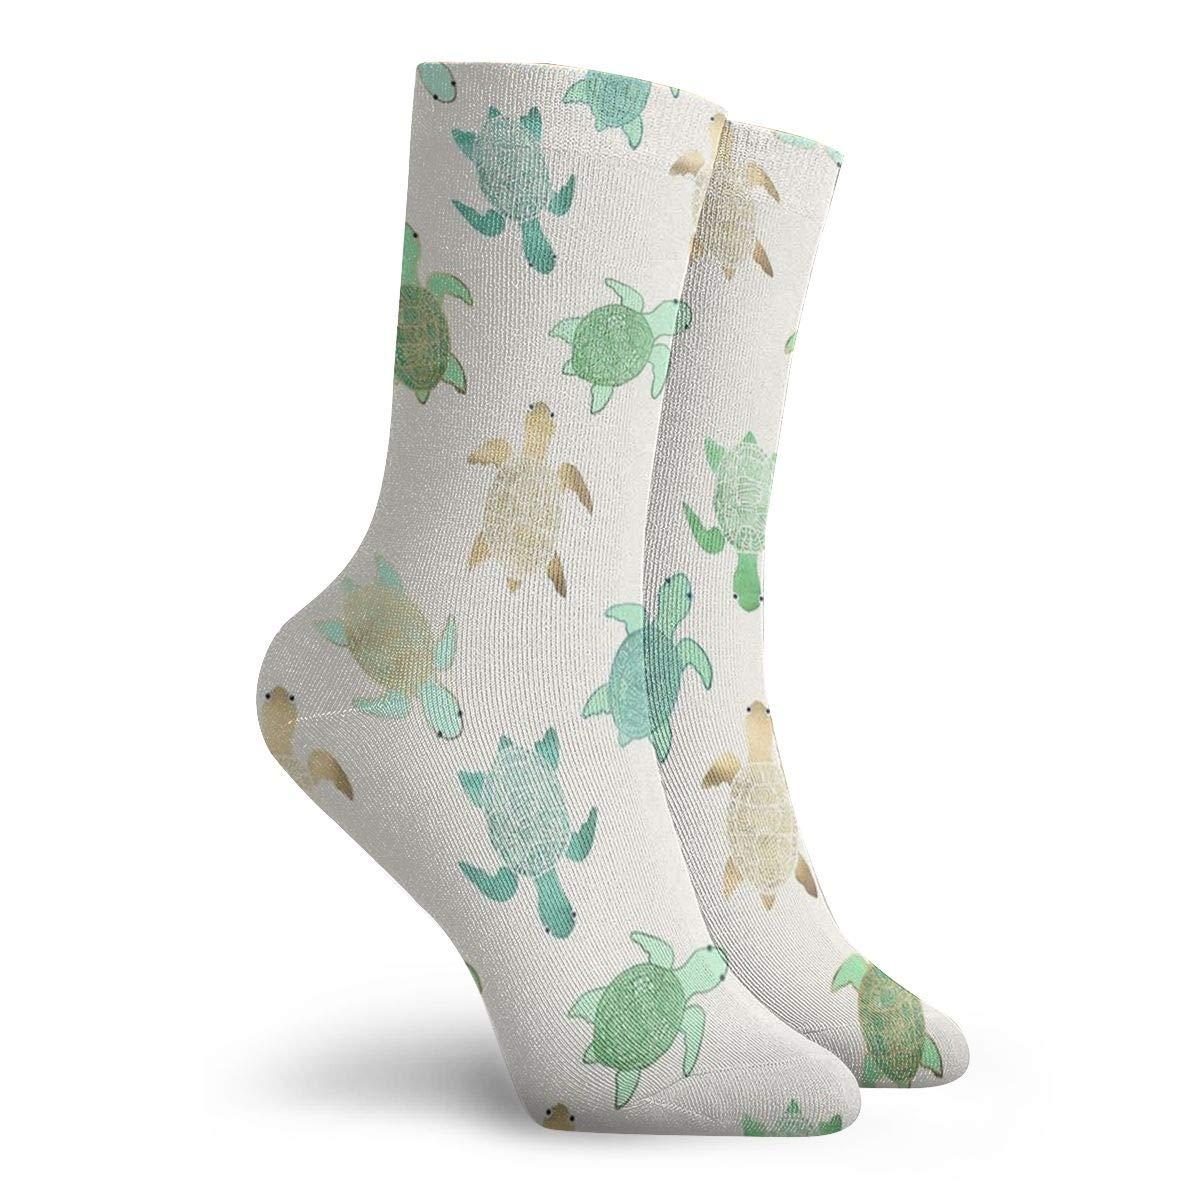 Tortoise Unisex Funny Casual Crew Socks Athletic Socks For Boys Girls Kids Teenagers